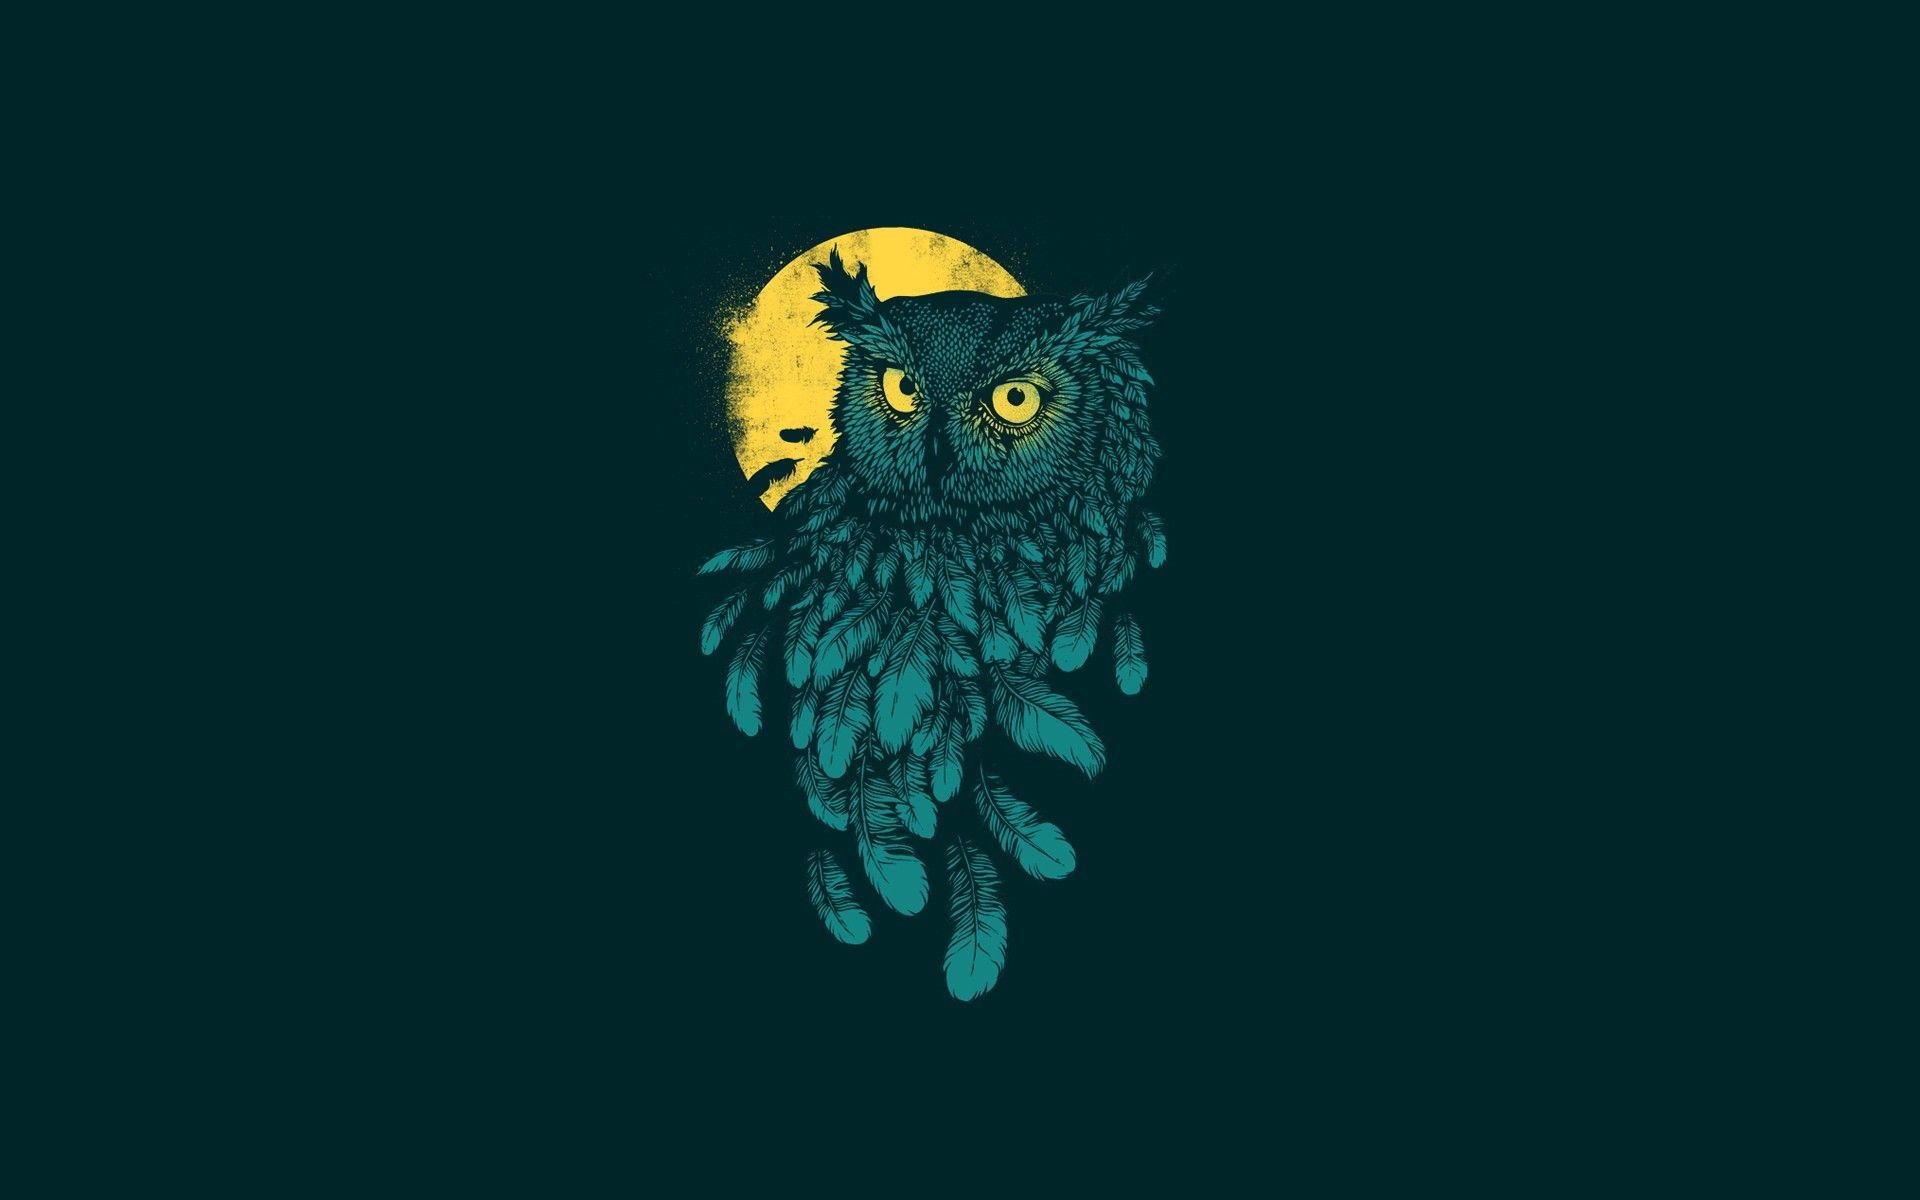 General 1920x1200 Digital Art Minimalism Animals Owl Feathers Moon Yellow Eyes Simple Background Owl Background Owl Wallpaper Feather Wallpaper